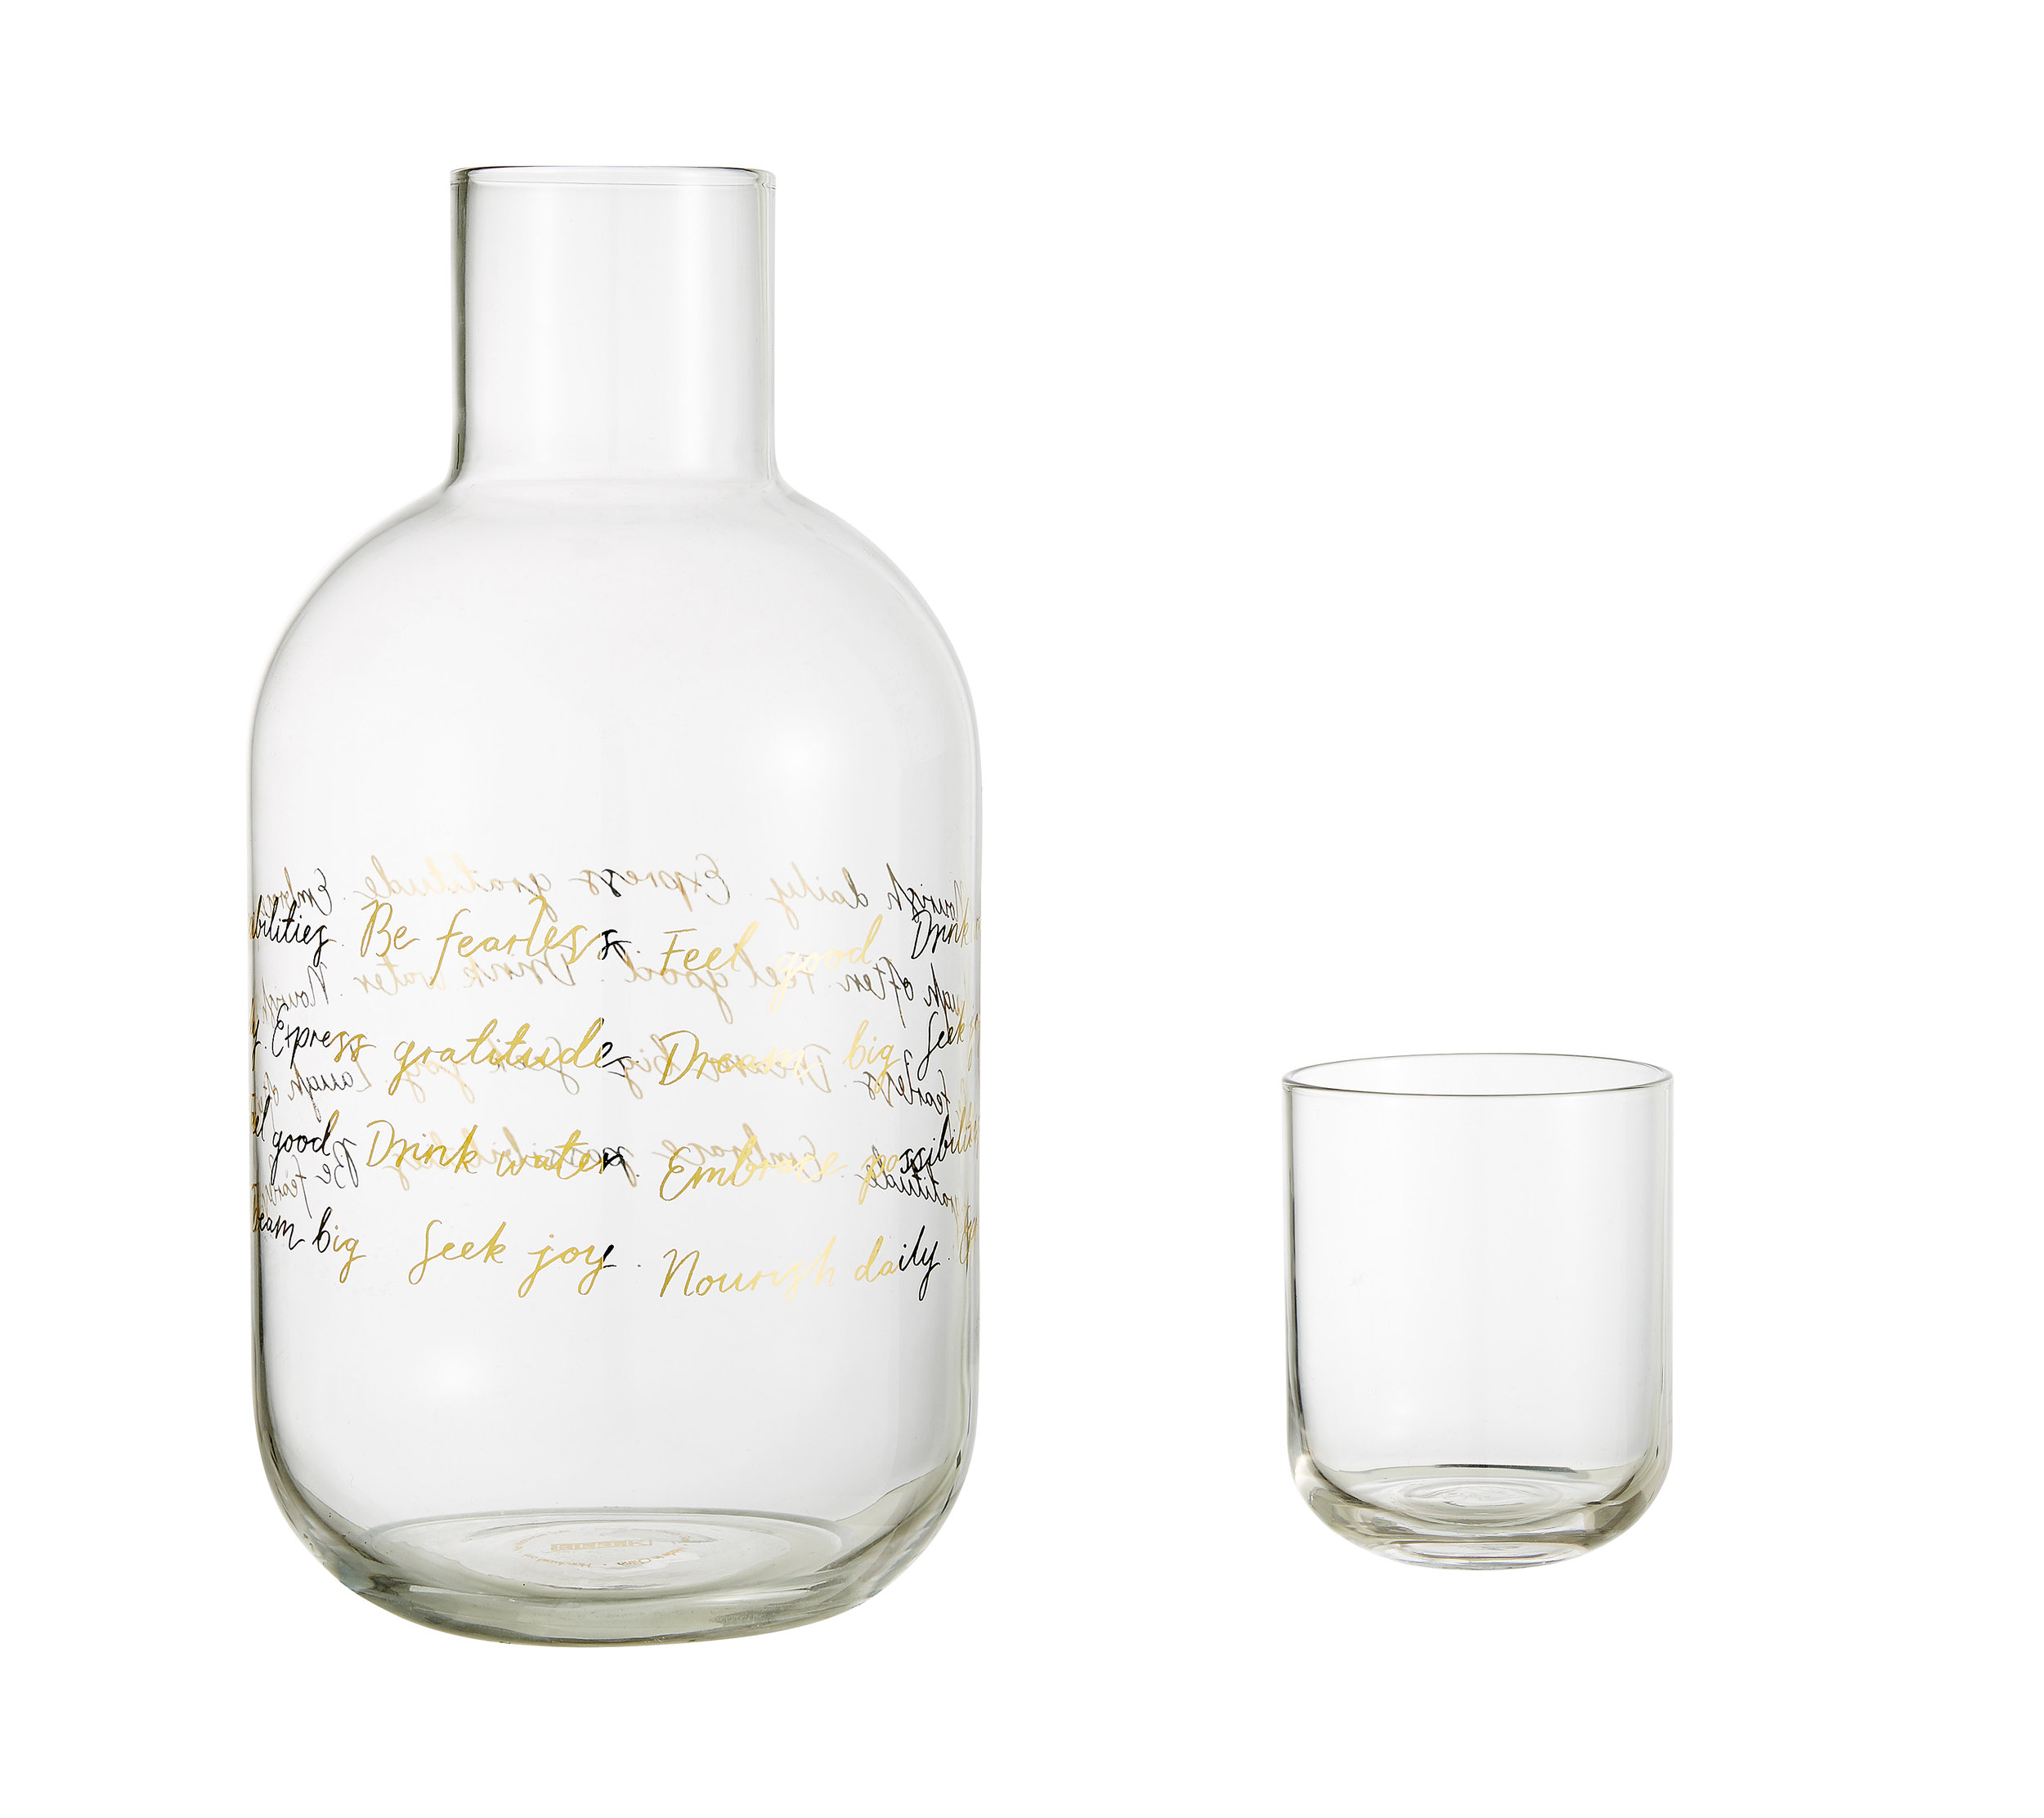 GLASS WATER BOTTLE WITH CUP: SVENSKA HEM £18.00